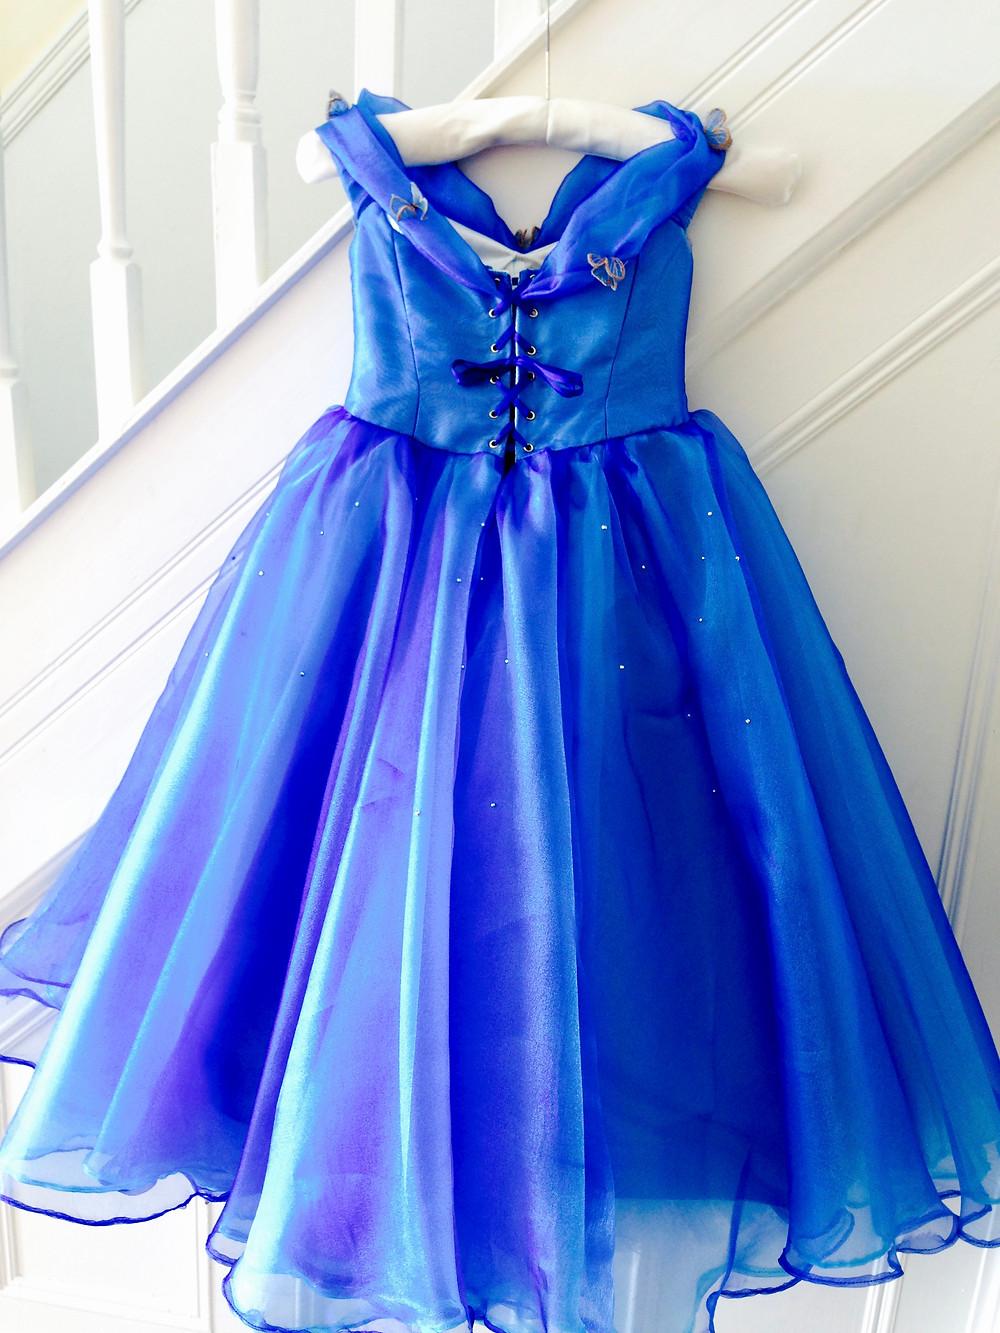 Cinderella dress back